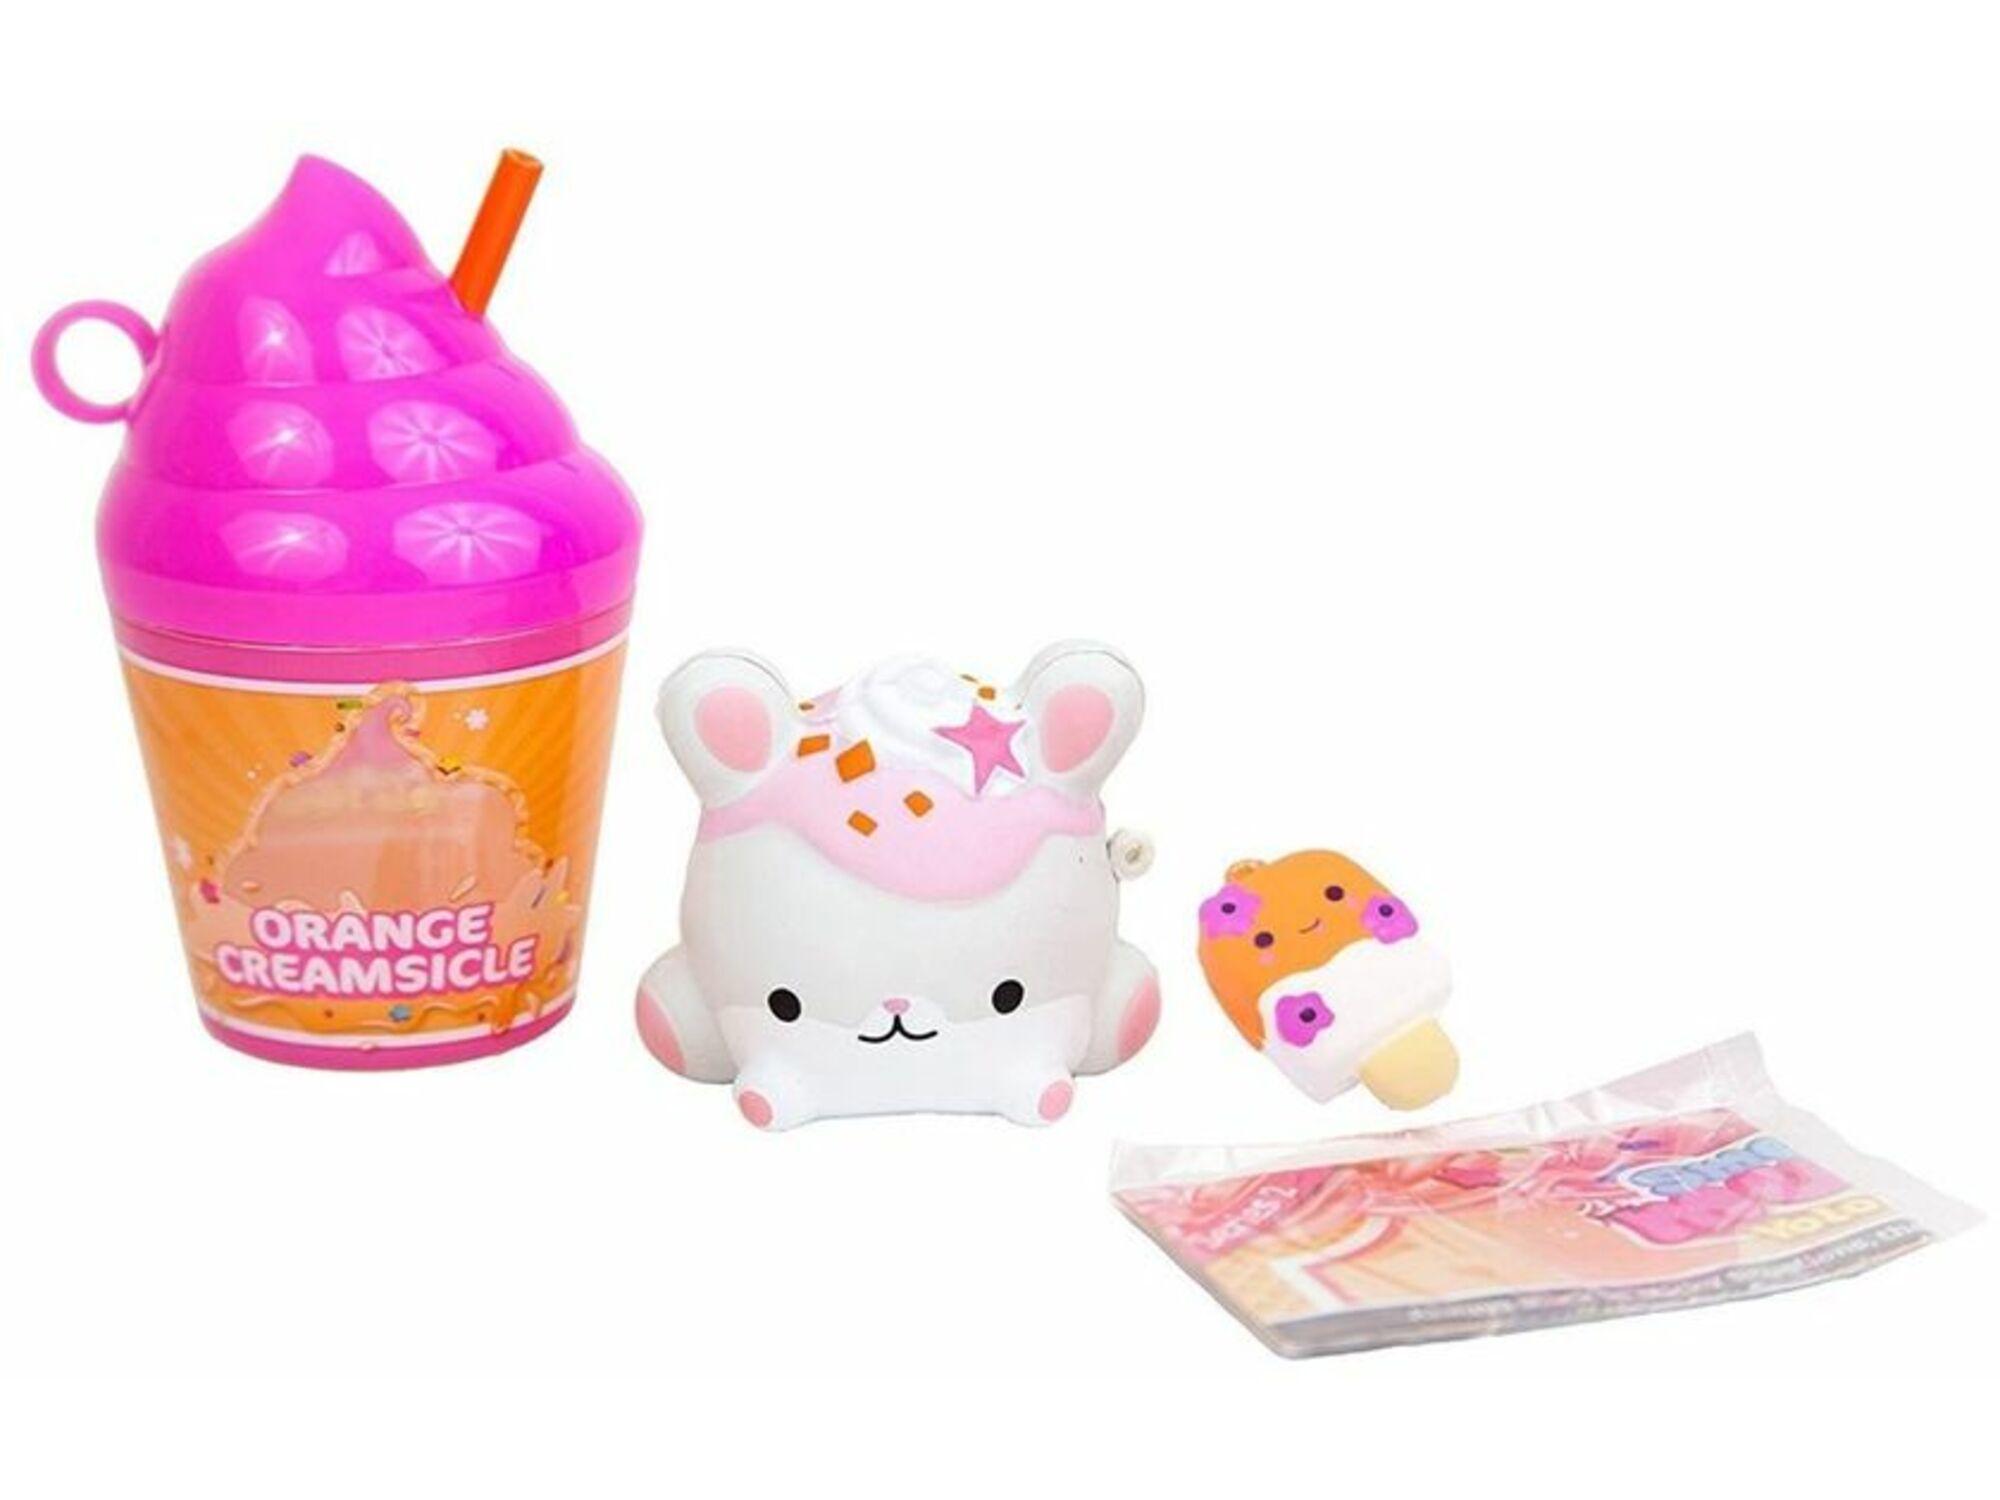 Smooshy Mushy S2 - Frozen Delights Yolo Froyo 40-00016